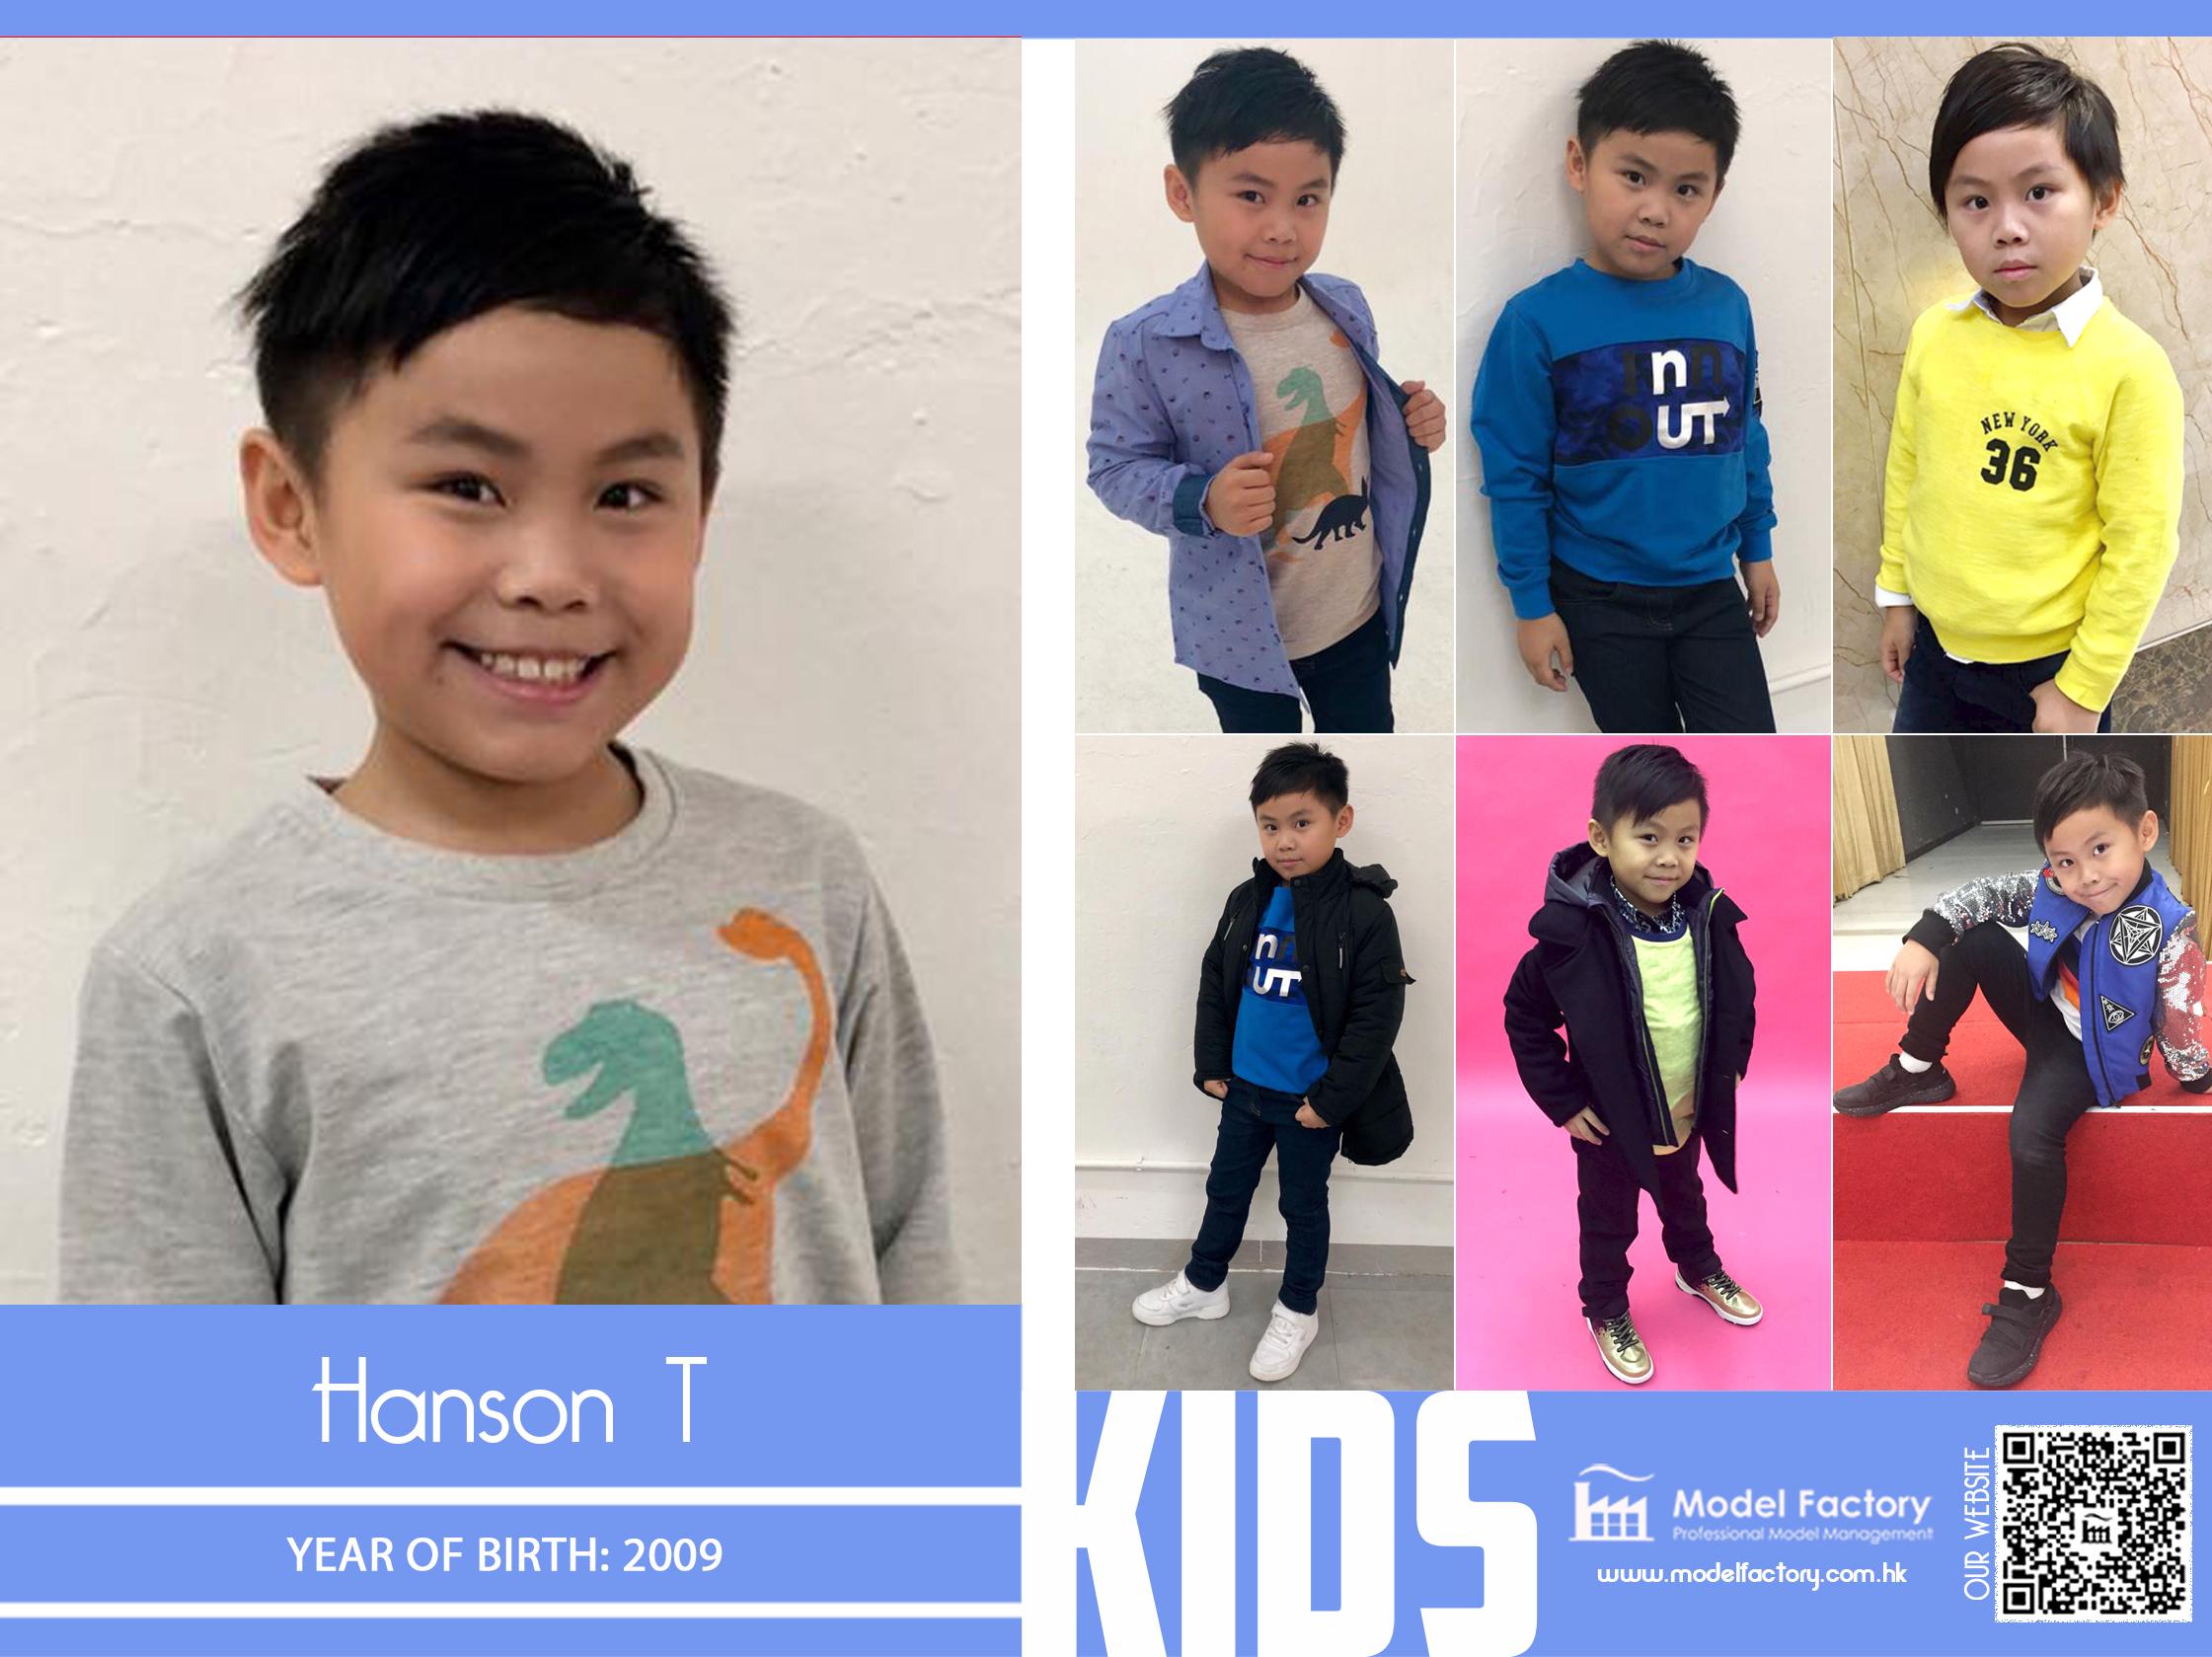 Model Factory Local Kids Model Hanson T